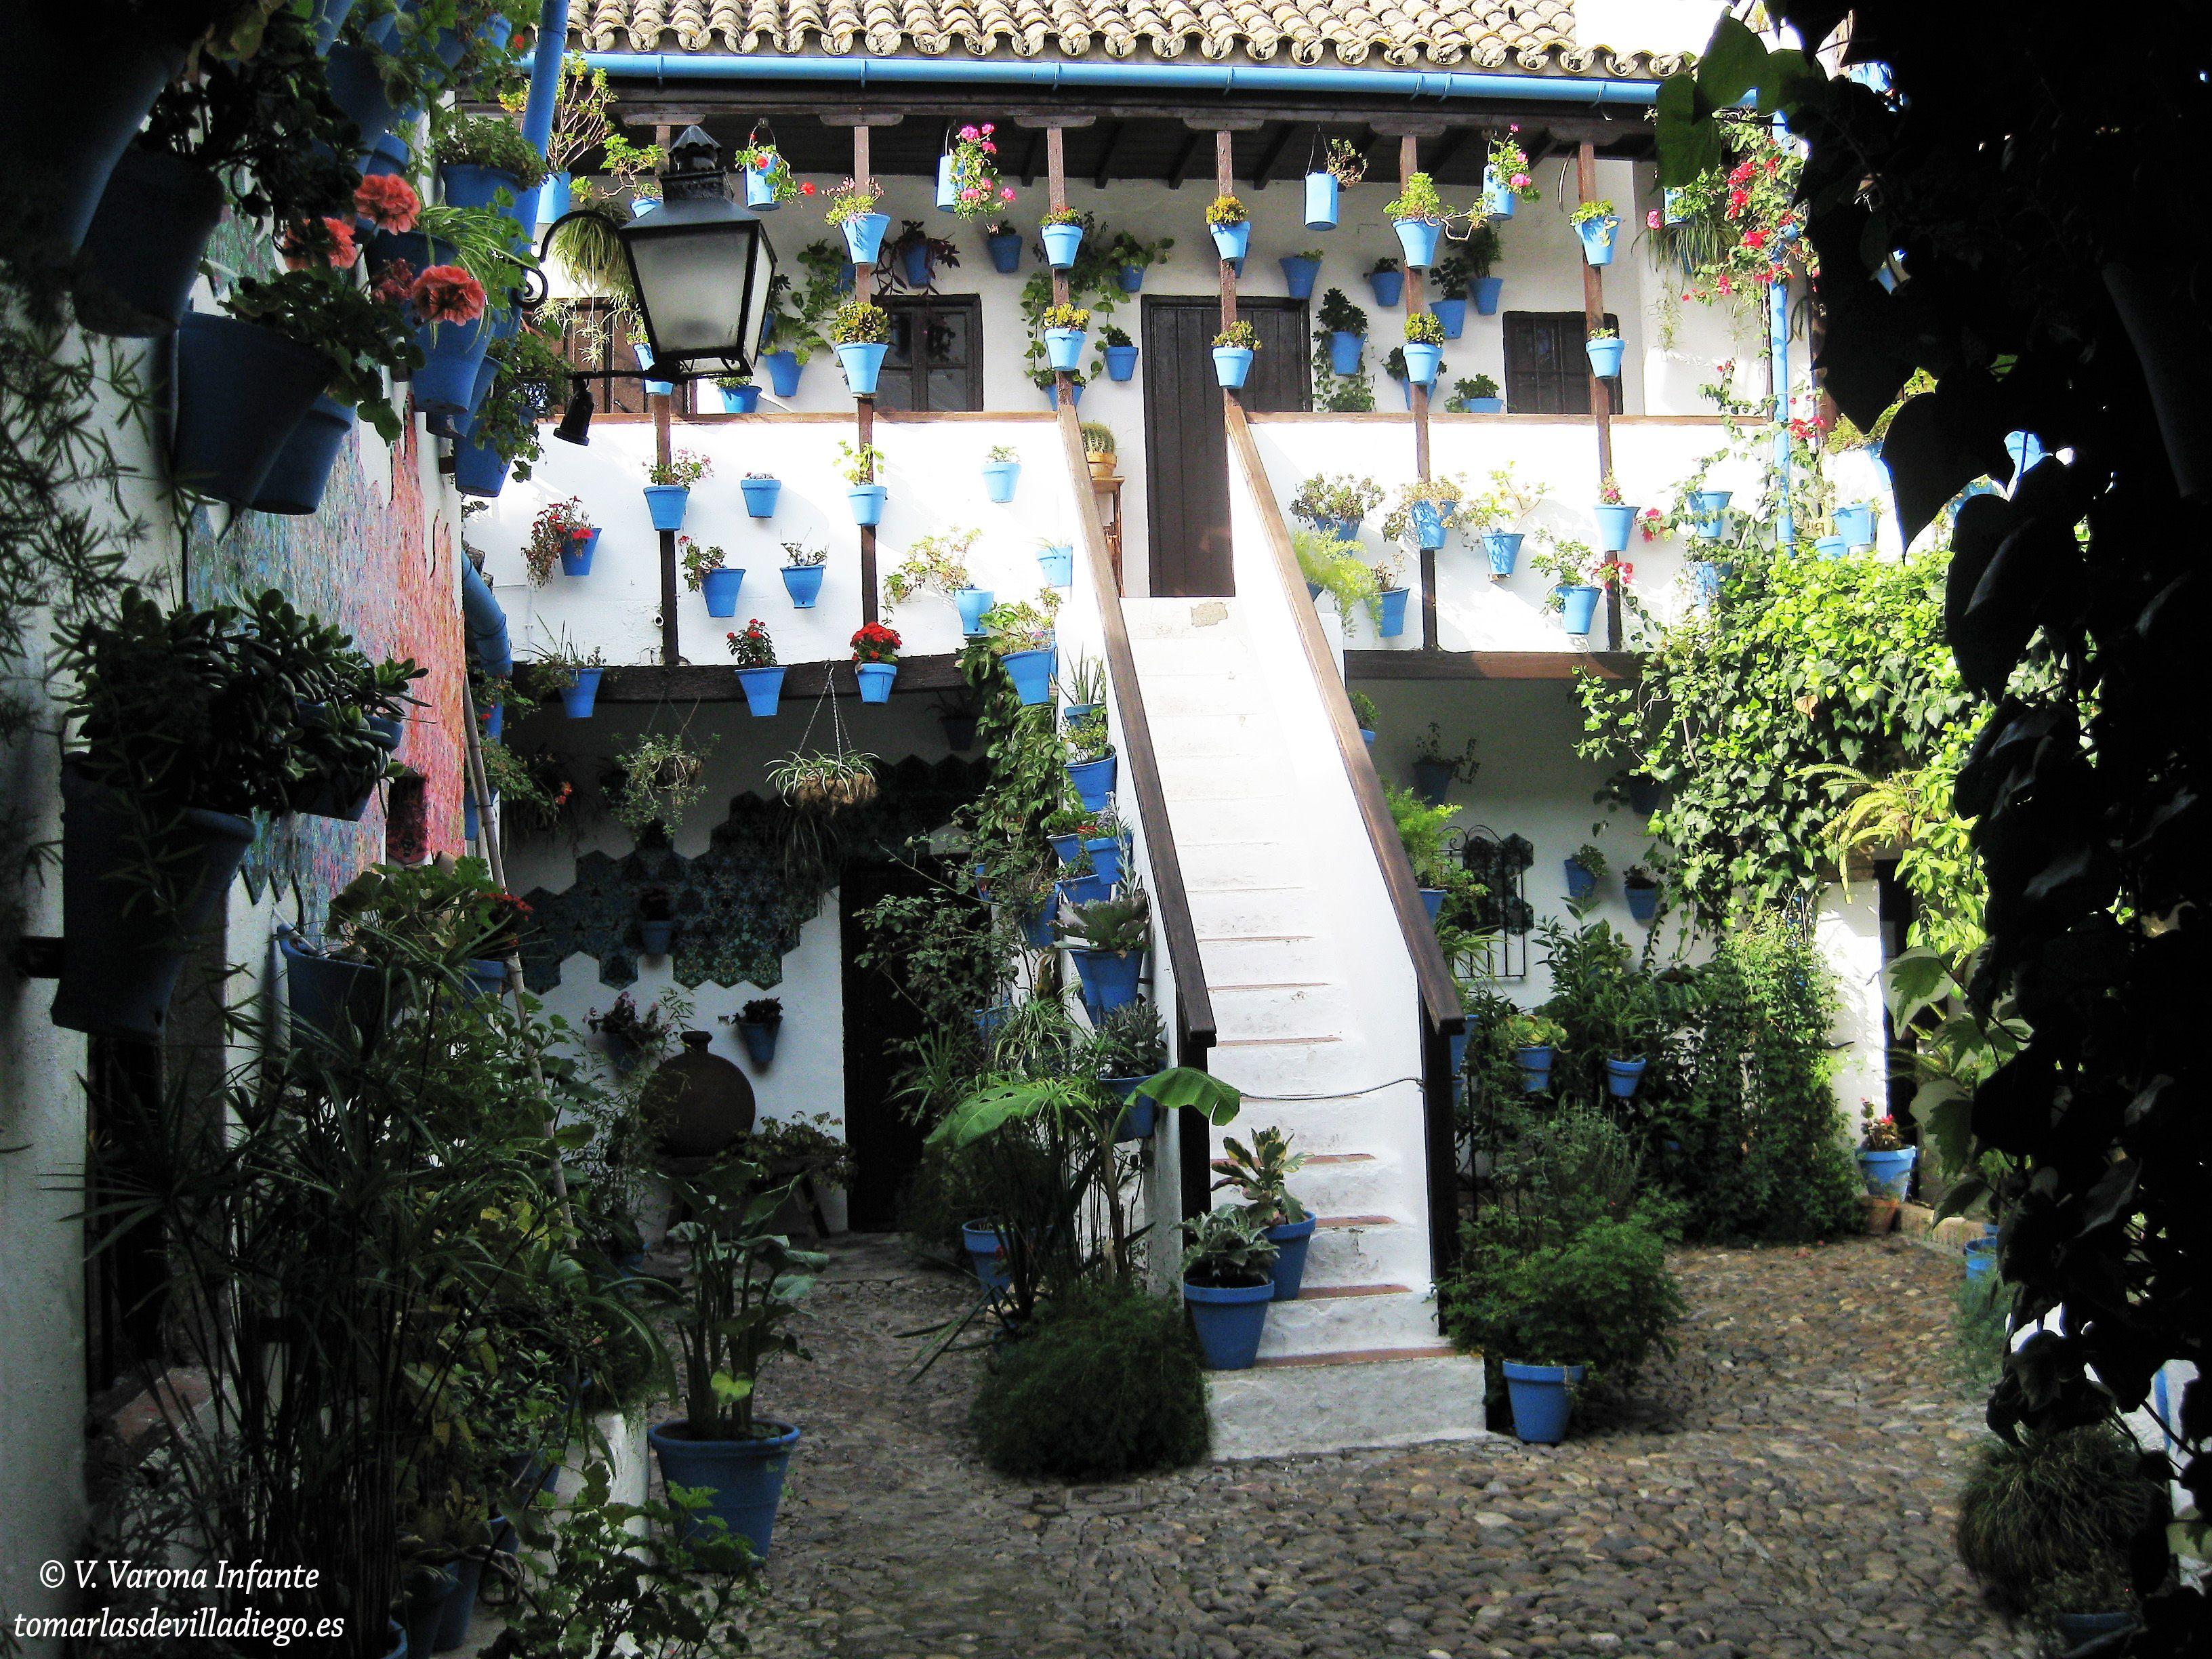 Patio Cordob S C Doba Andaluc A Espa A Lugares Que Visitar  # Muebles Astorga Vejer